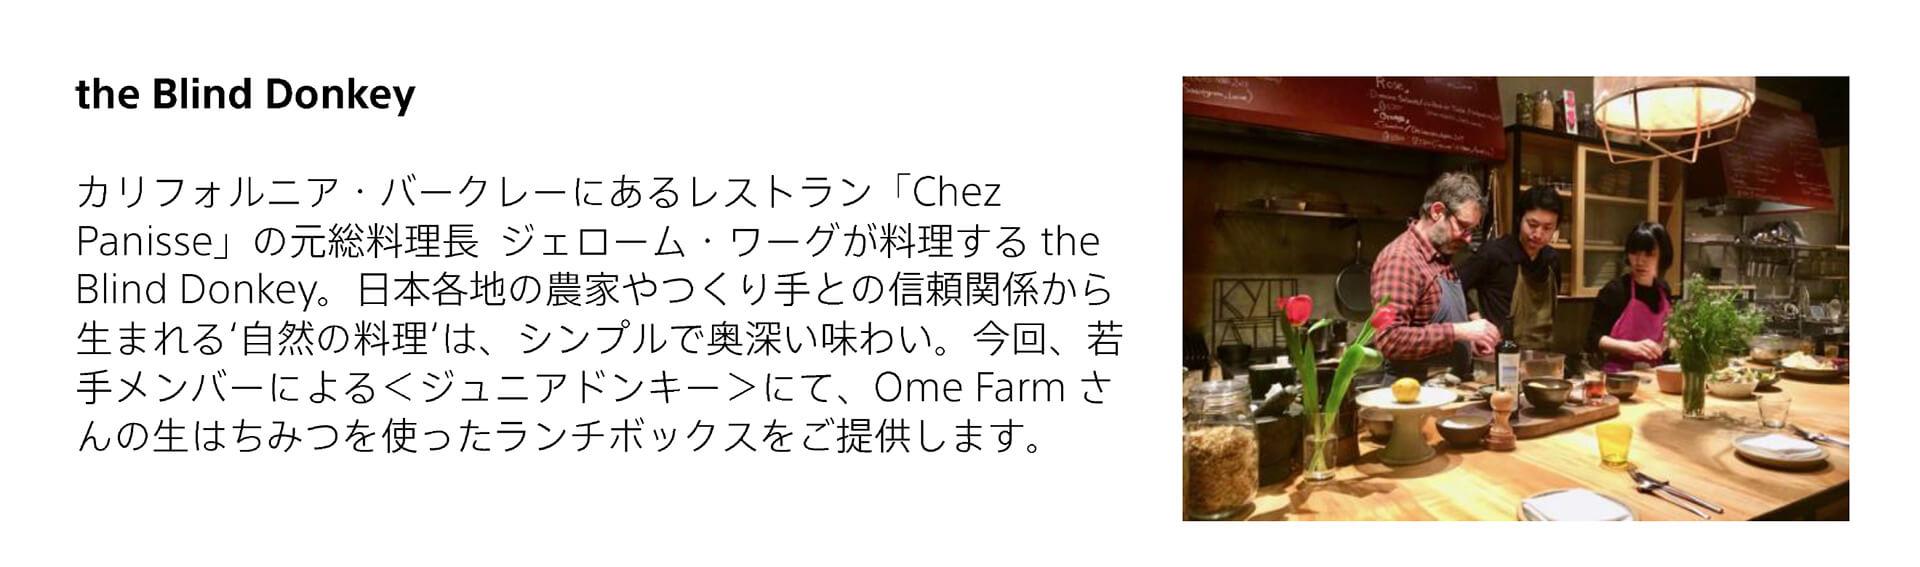 Ginza Sony Park (銀座ソニーパーク)「銀座フレンズ青空市」